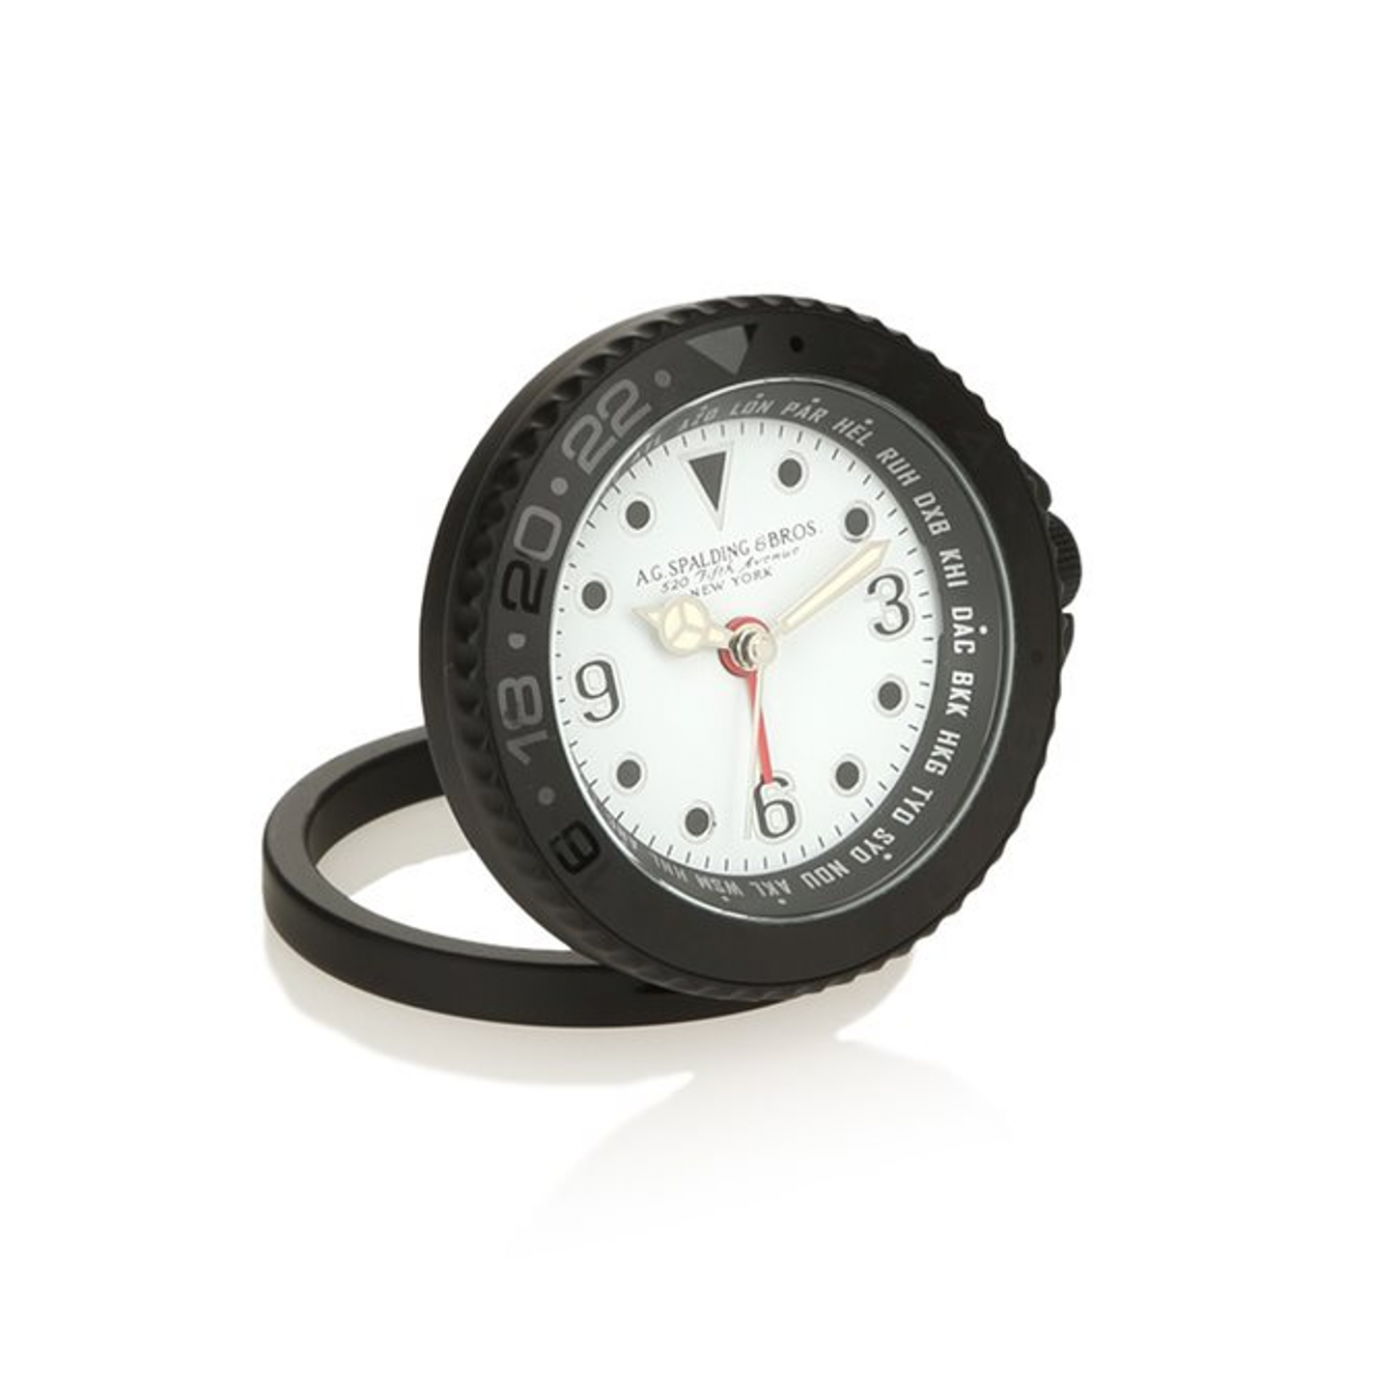 AG SPALDING & BROS GMT orologio sveglia da viaggio, bianco